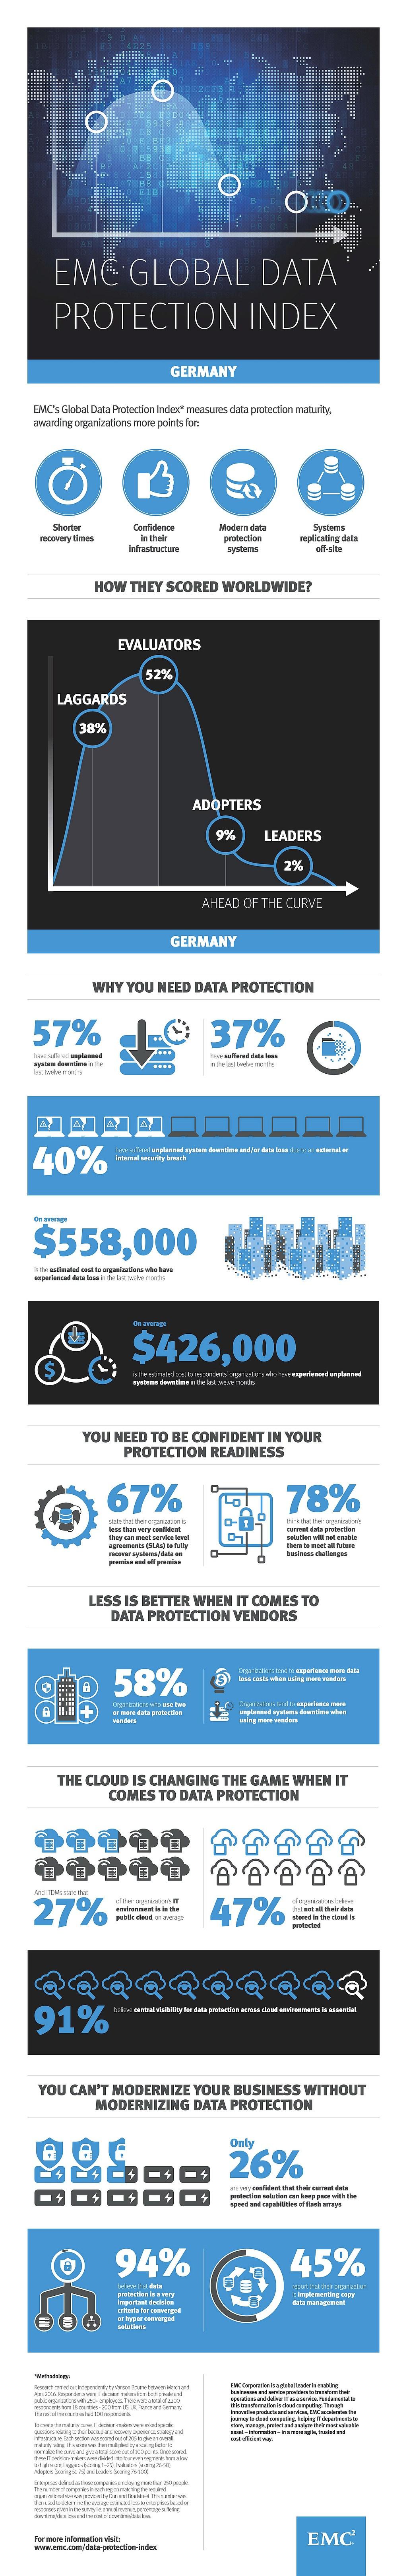 infografik emc global data protection index de